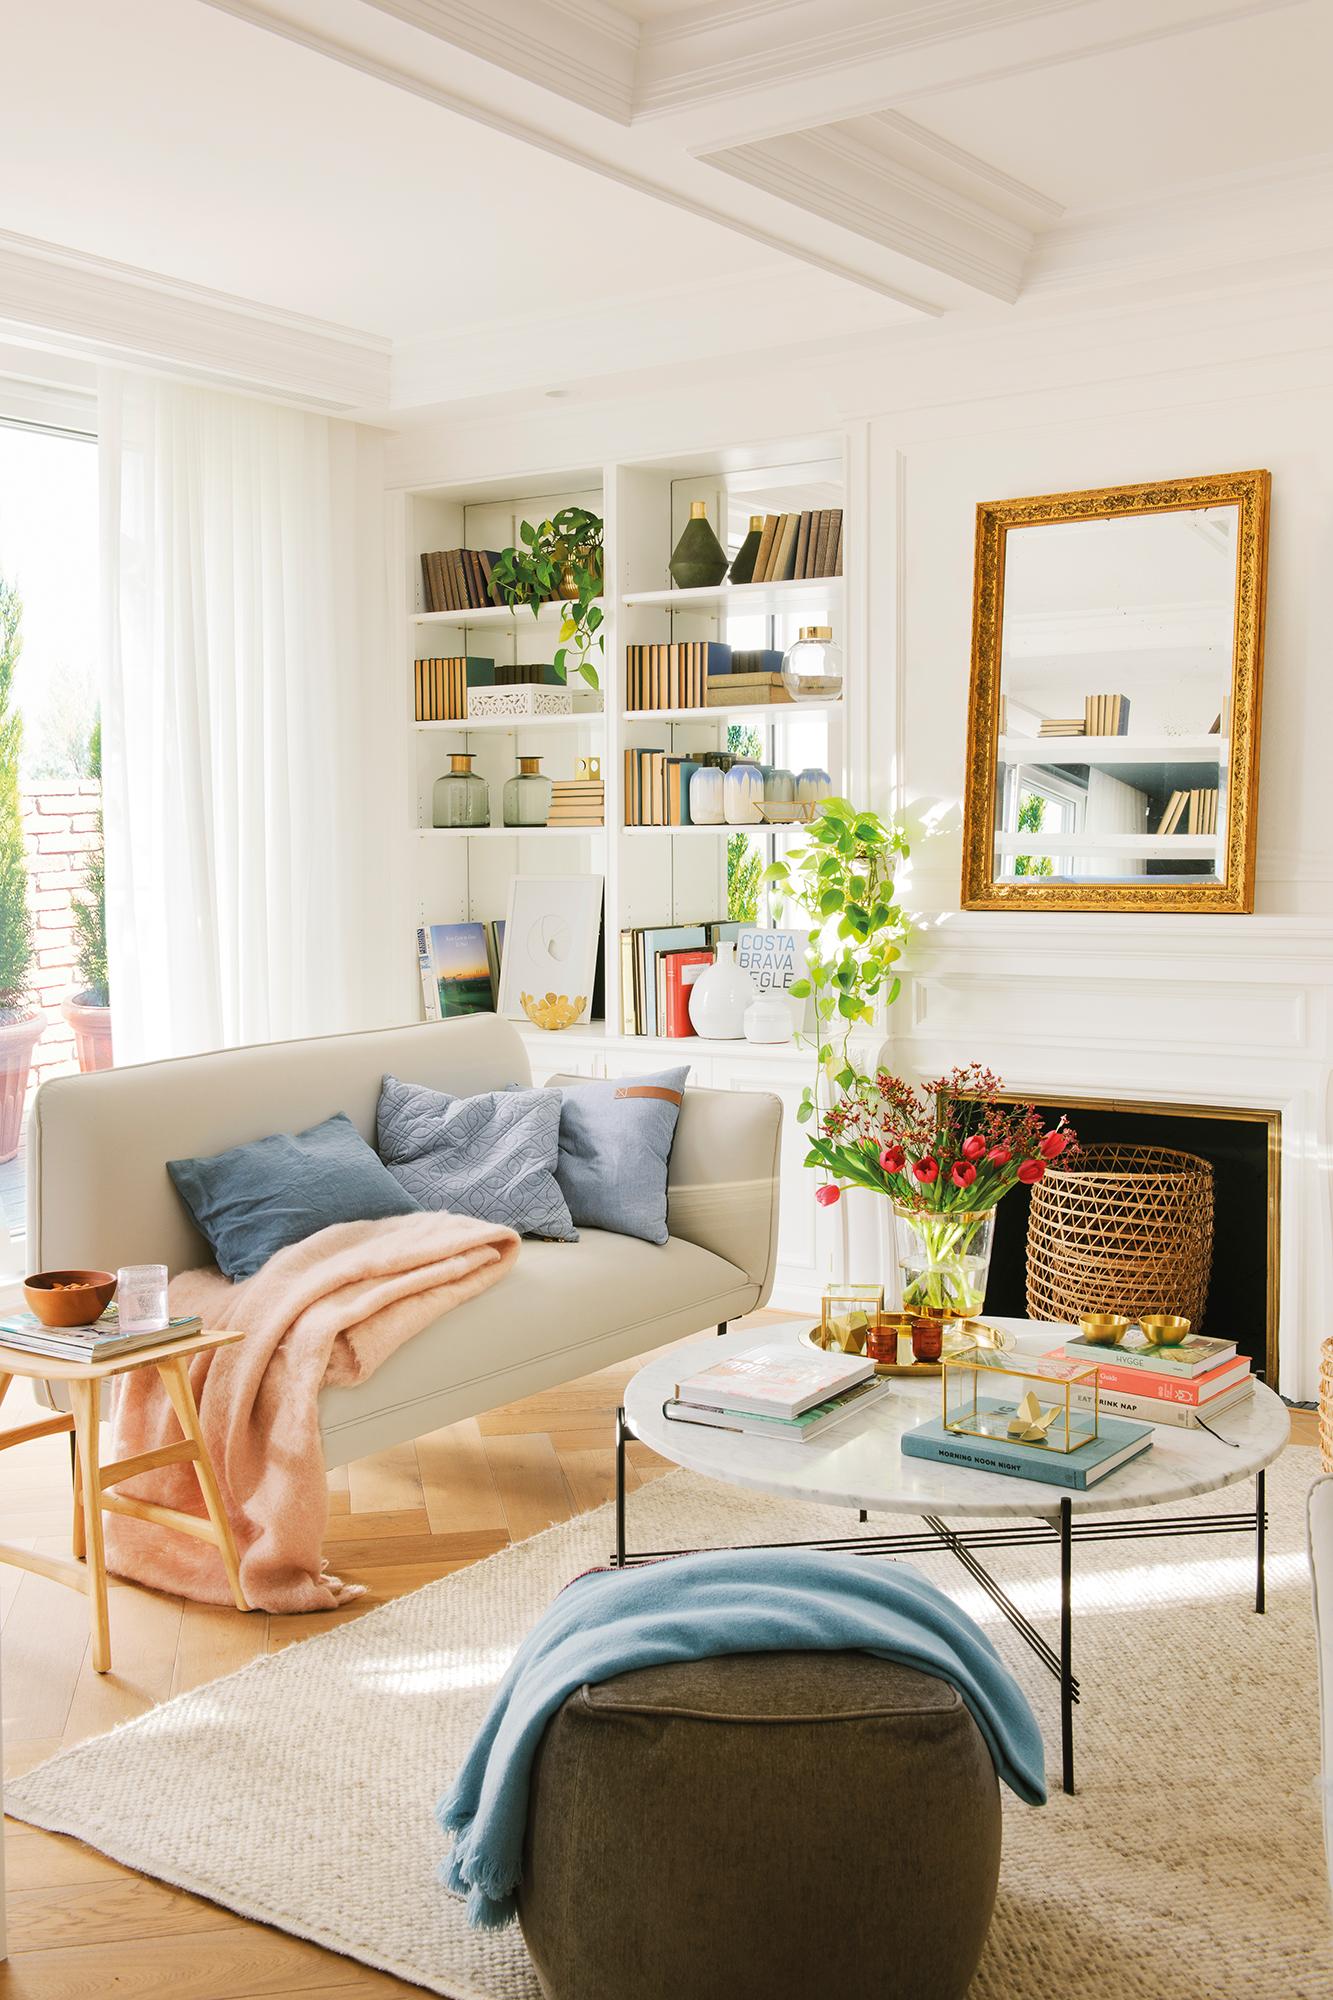 Alquilar un piso: claves para acertar